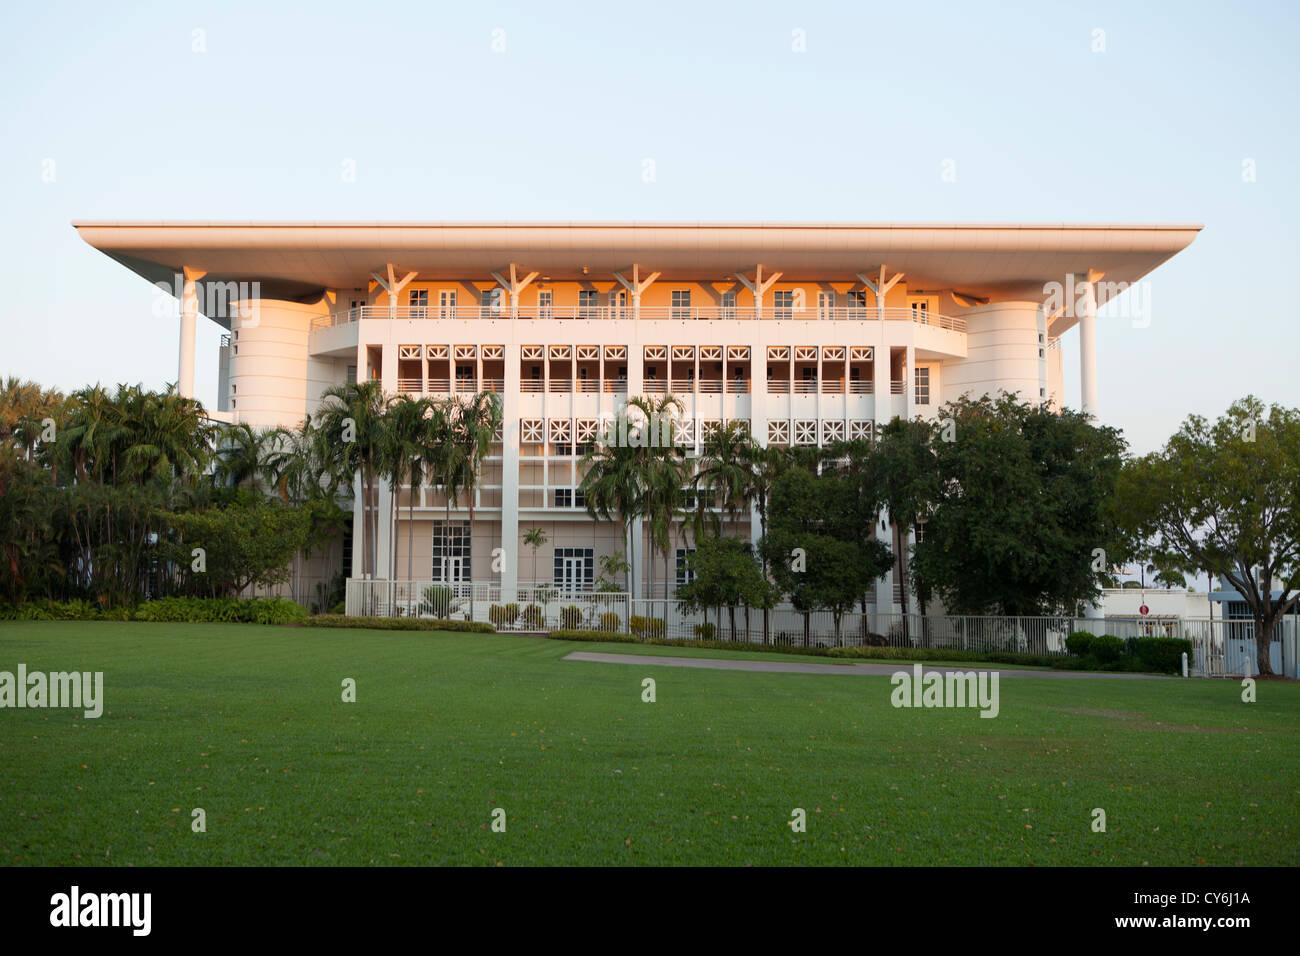 NT Parliament House in Darwin, Northern Territory, Australia. - Stock Image